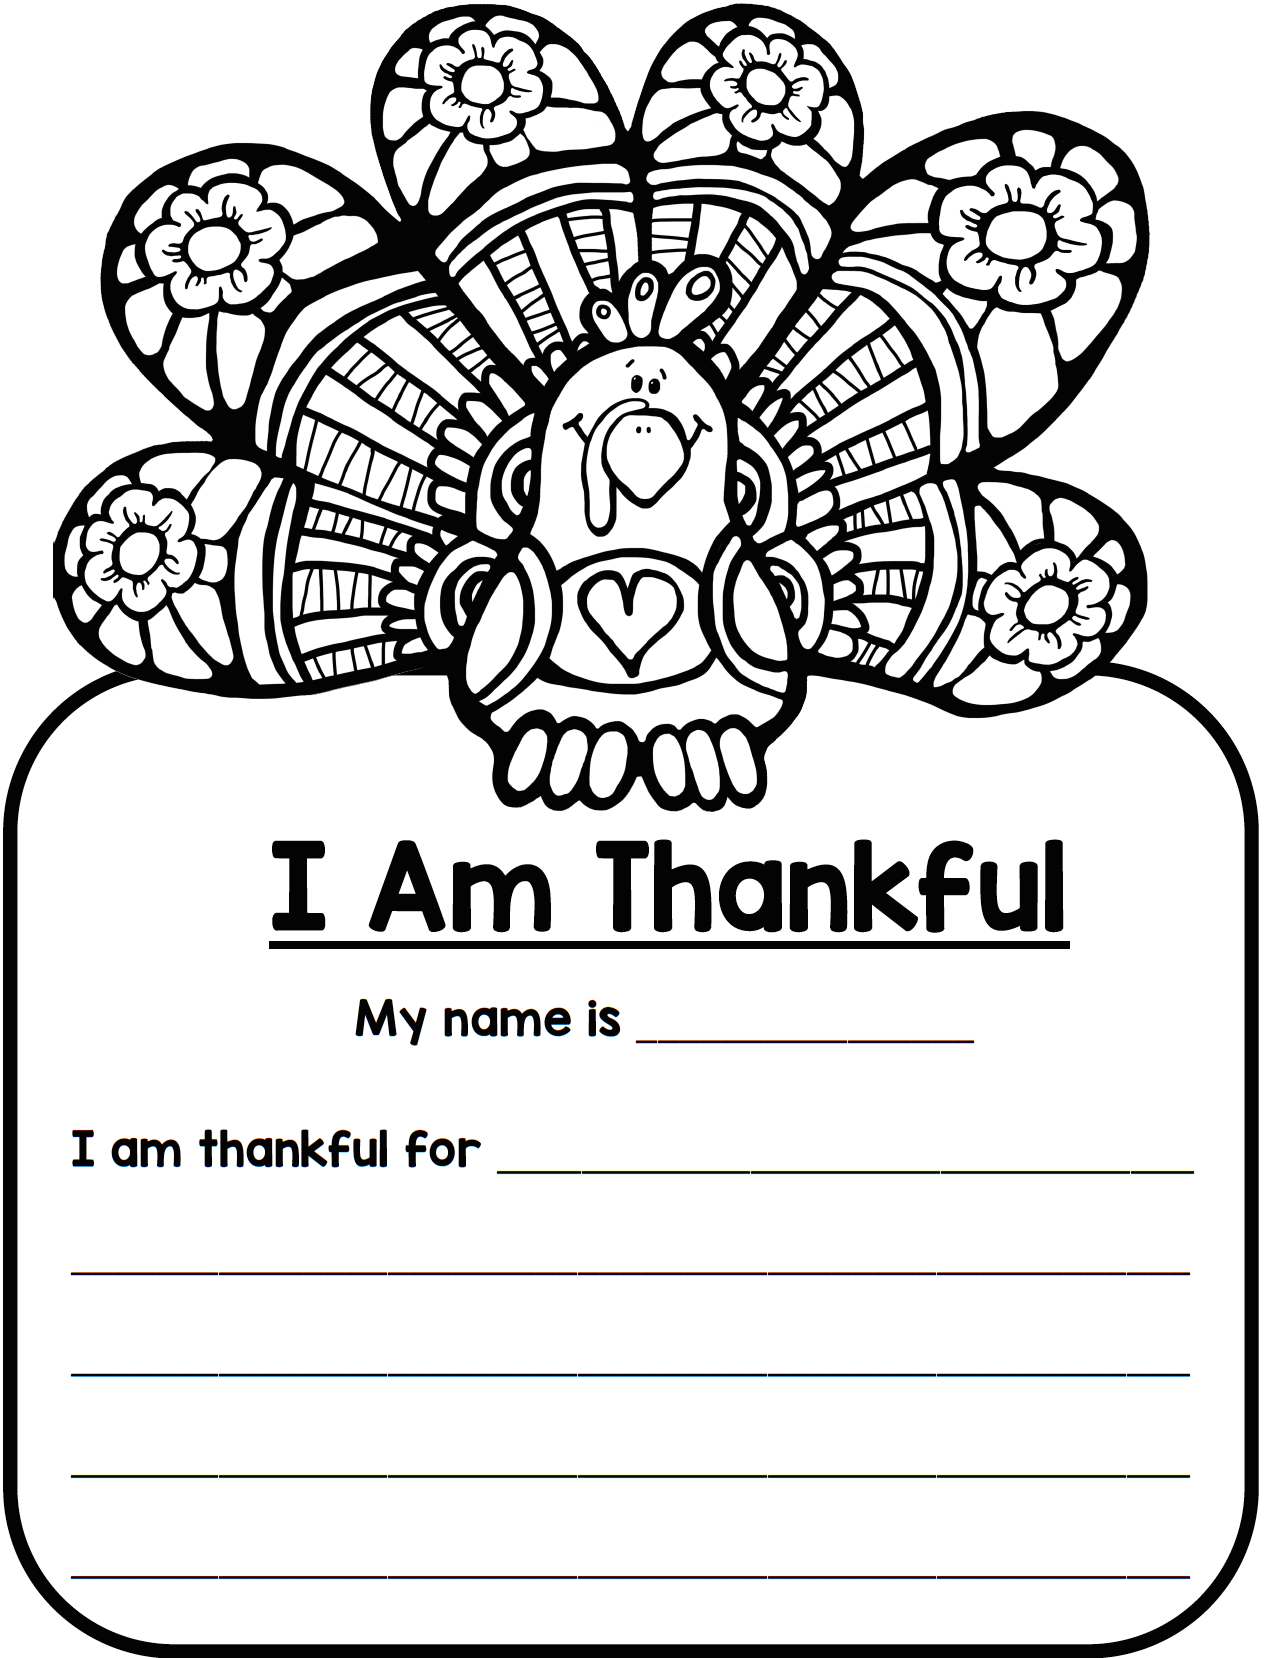 Teaching Gratitude And Kindness Education November Thanksgiving